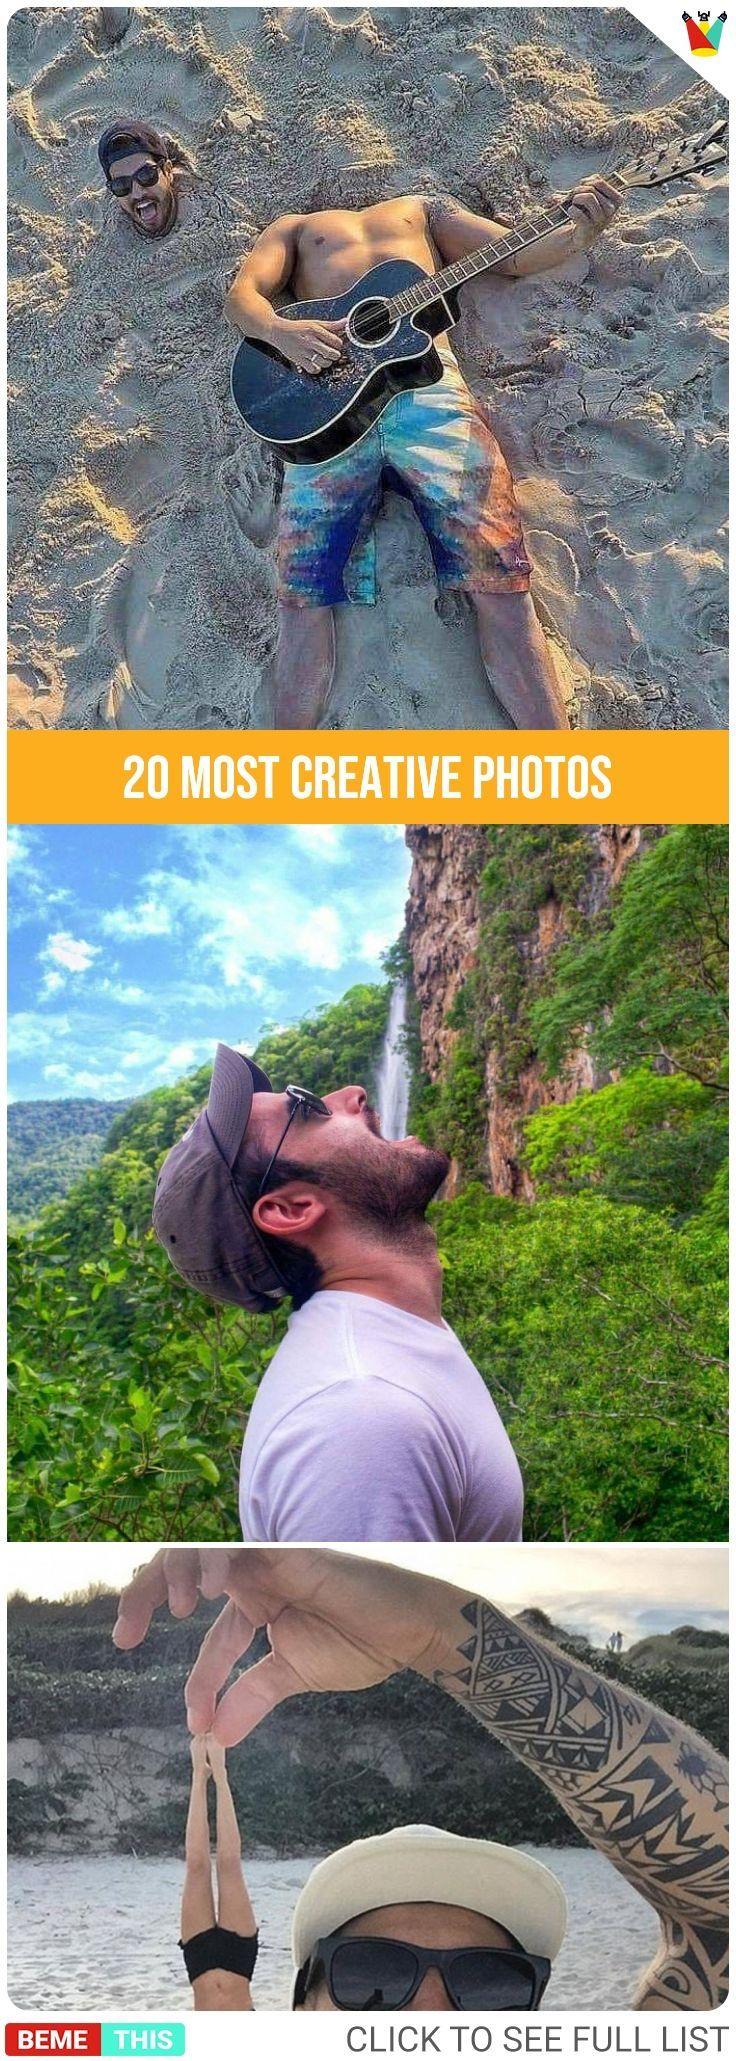 20 Die meisten kreativen Fotos bemethis